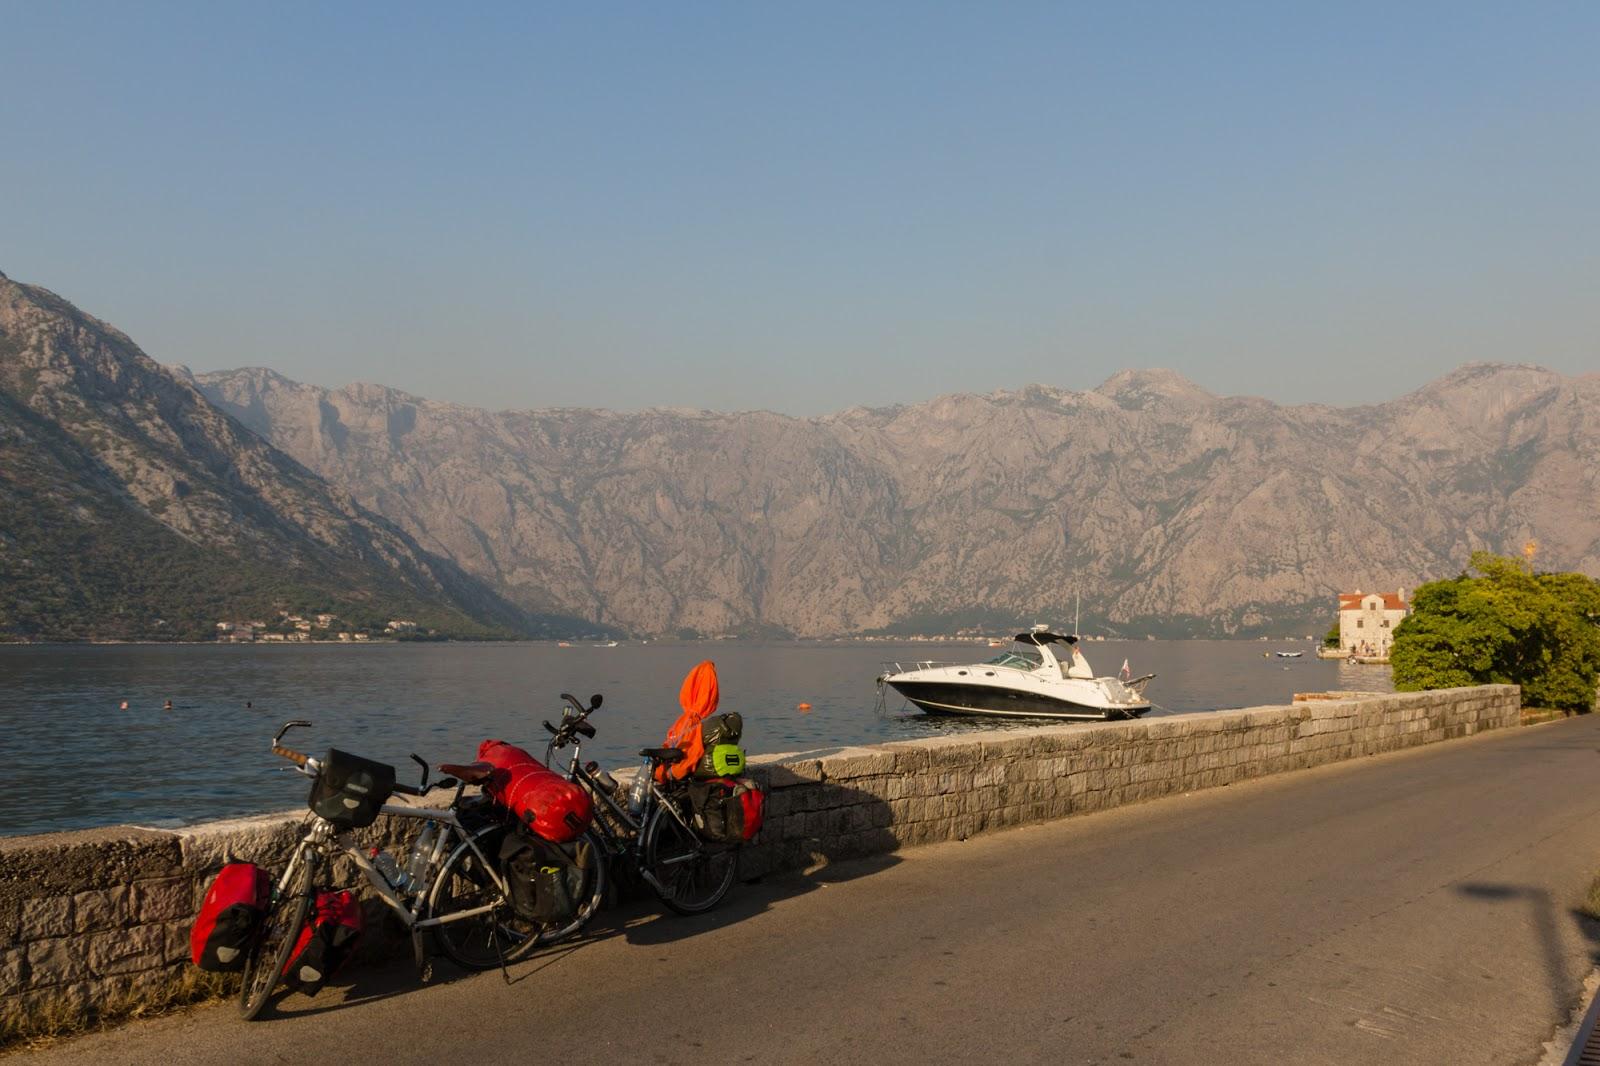 Montenegro U2013 Bay Of Kotor, Lake Skadar And Simonu0027s Parents Visit U2013 Rock,  Road U0026 Rhino